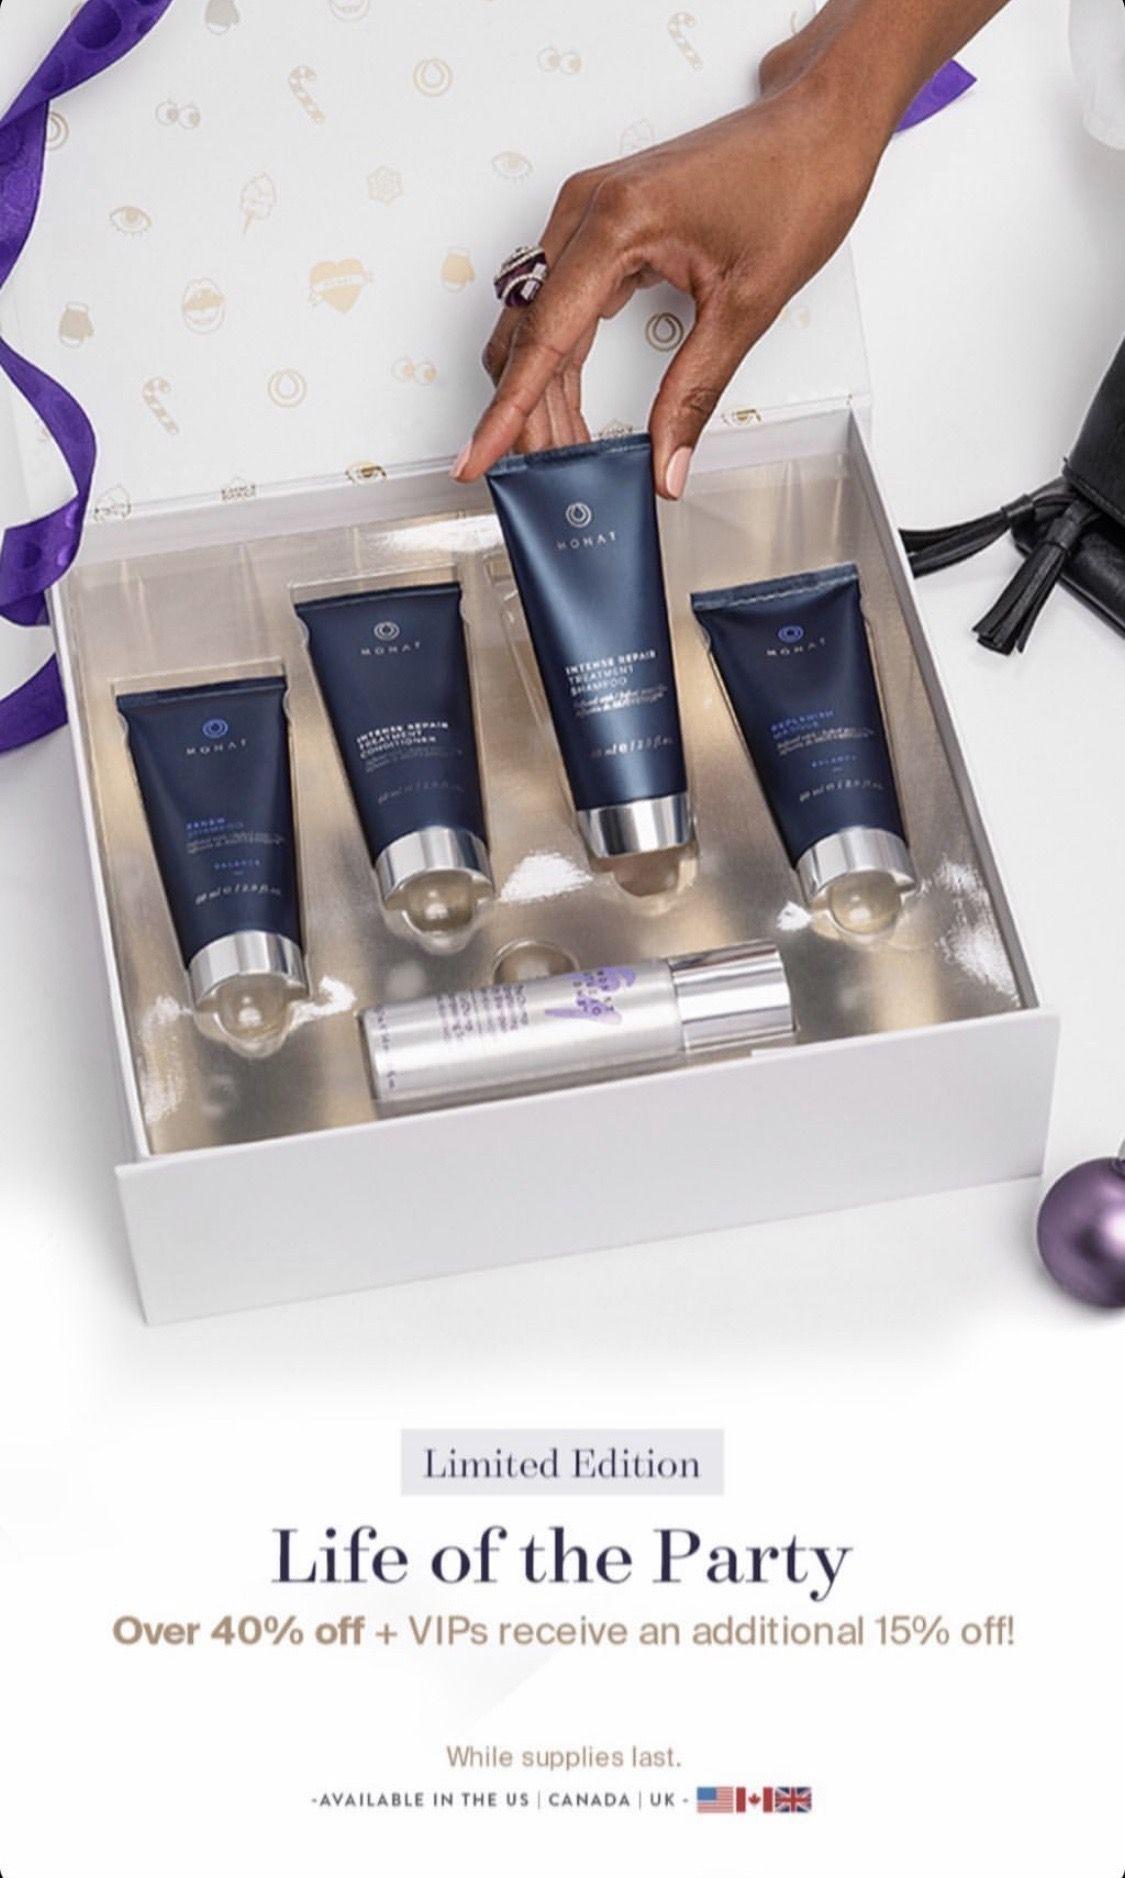 2019 Monat Holiday Sets Monat, Anti aging skin products